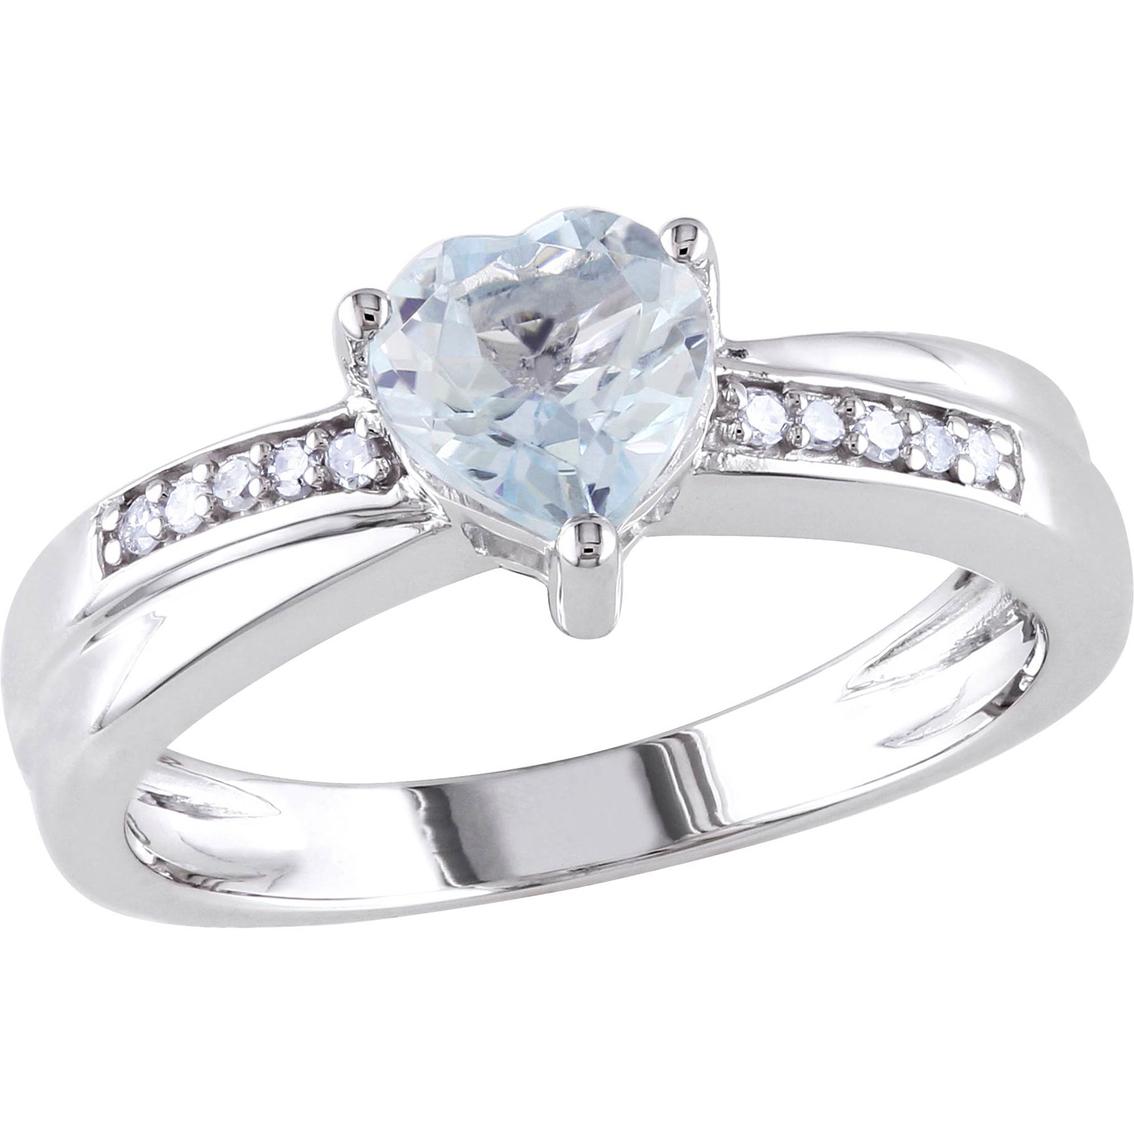 10k white gold aquamarine and diamond accent heart ring aquamarine